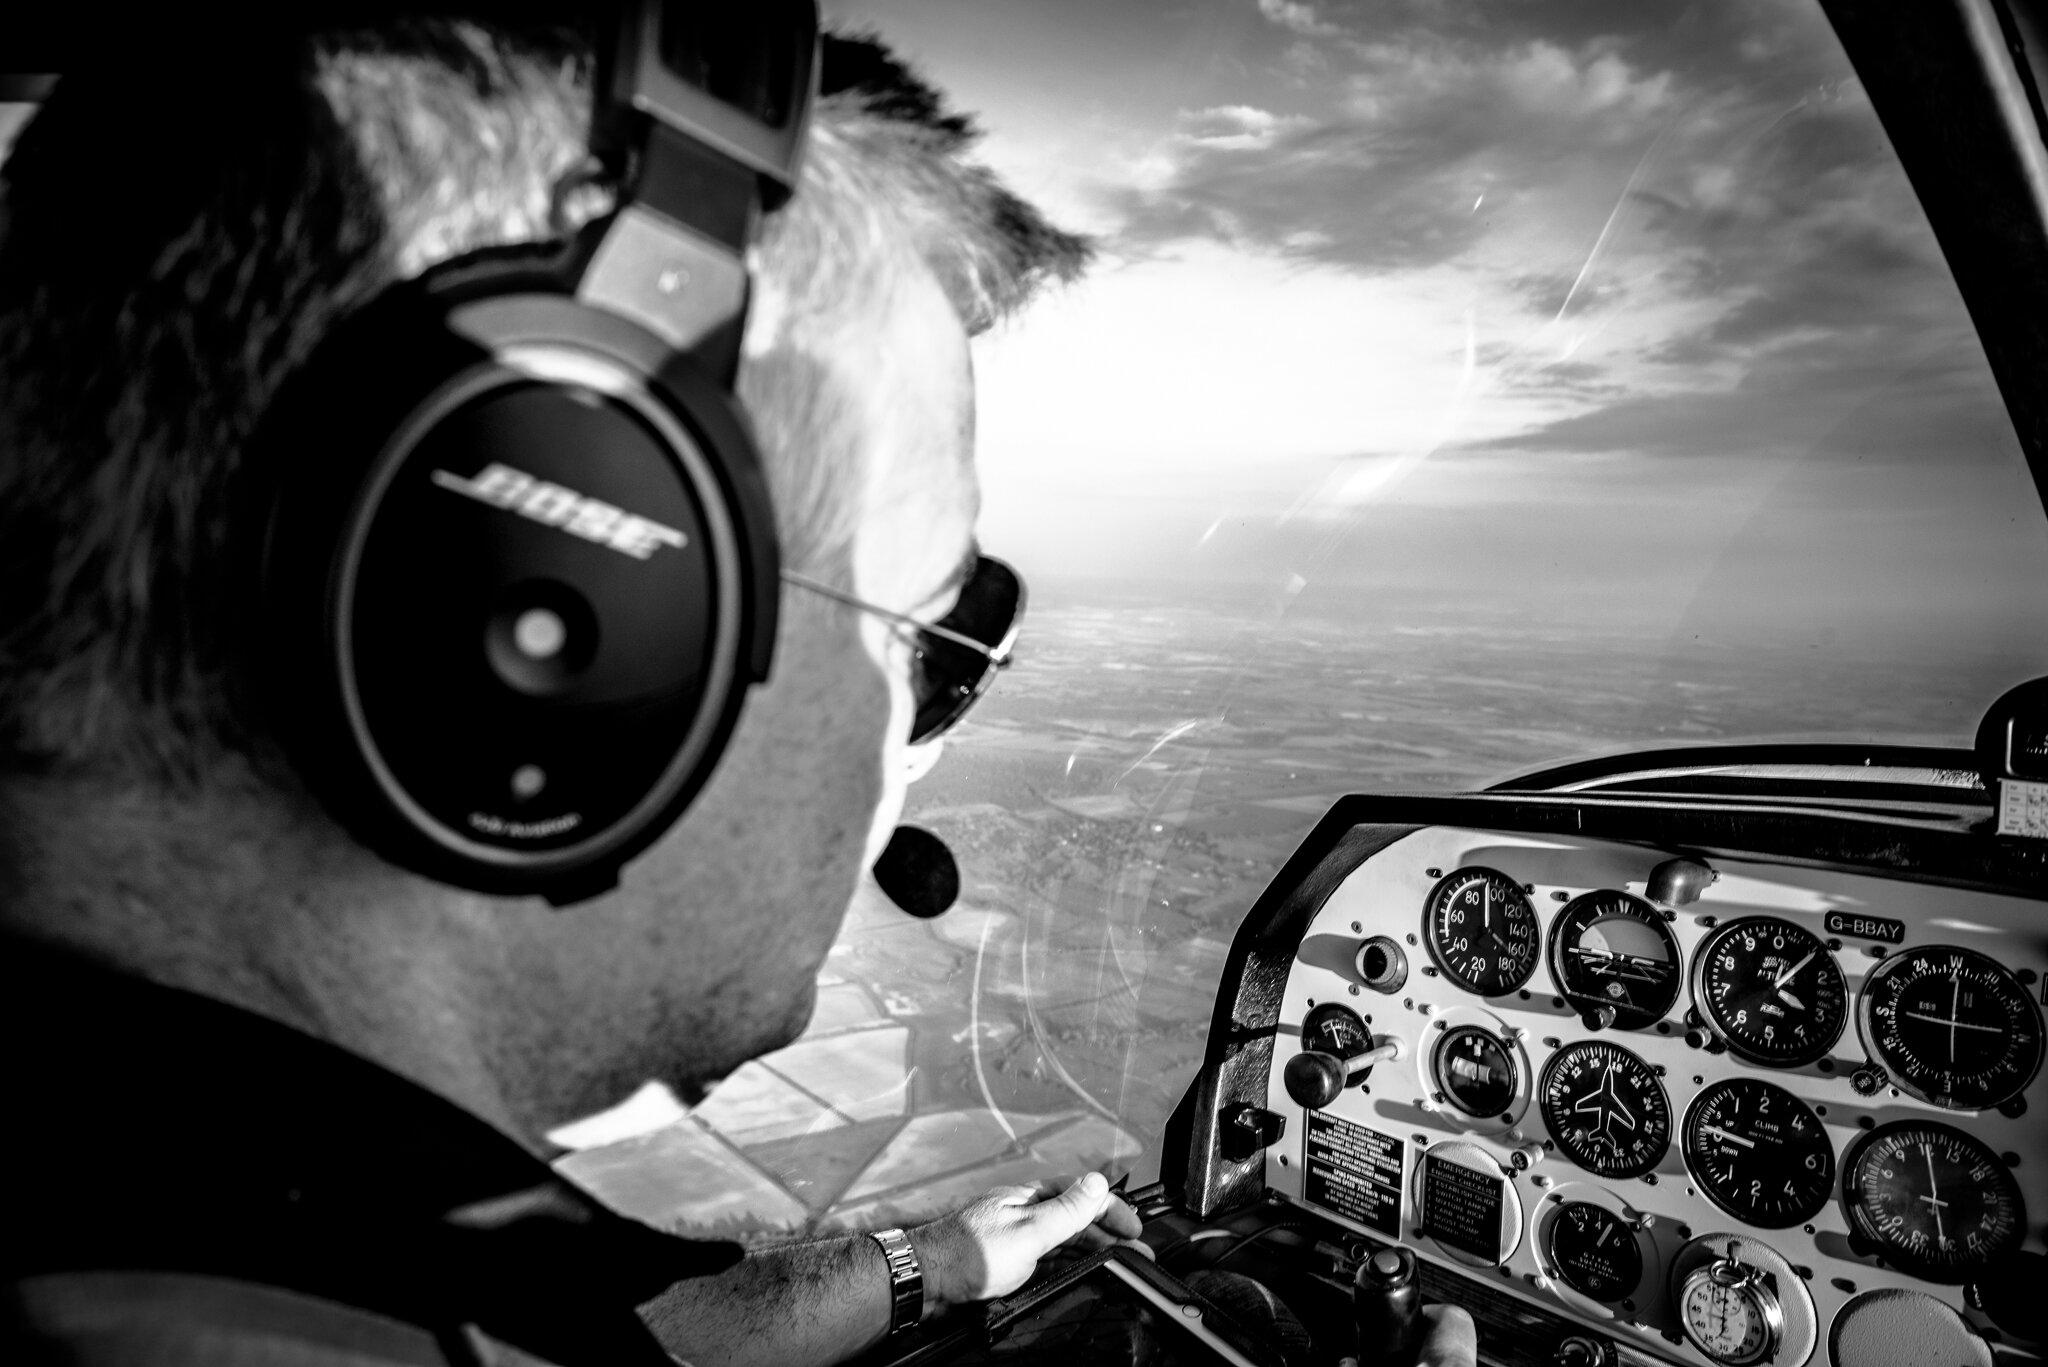 photo inside the cockpit of a Snowdonia flight school aircraft